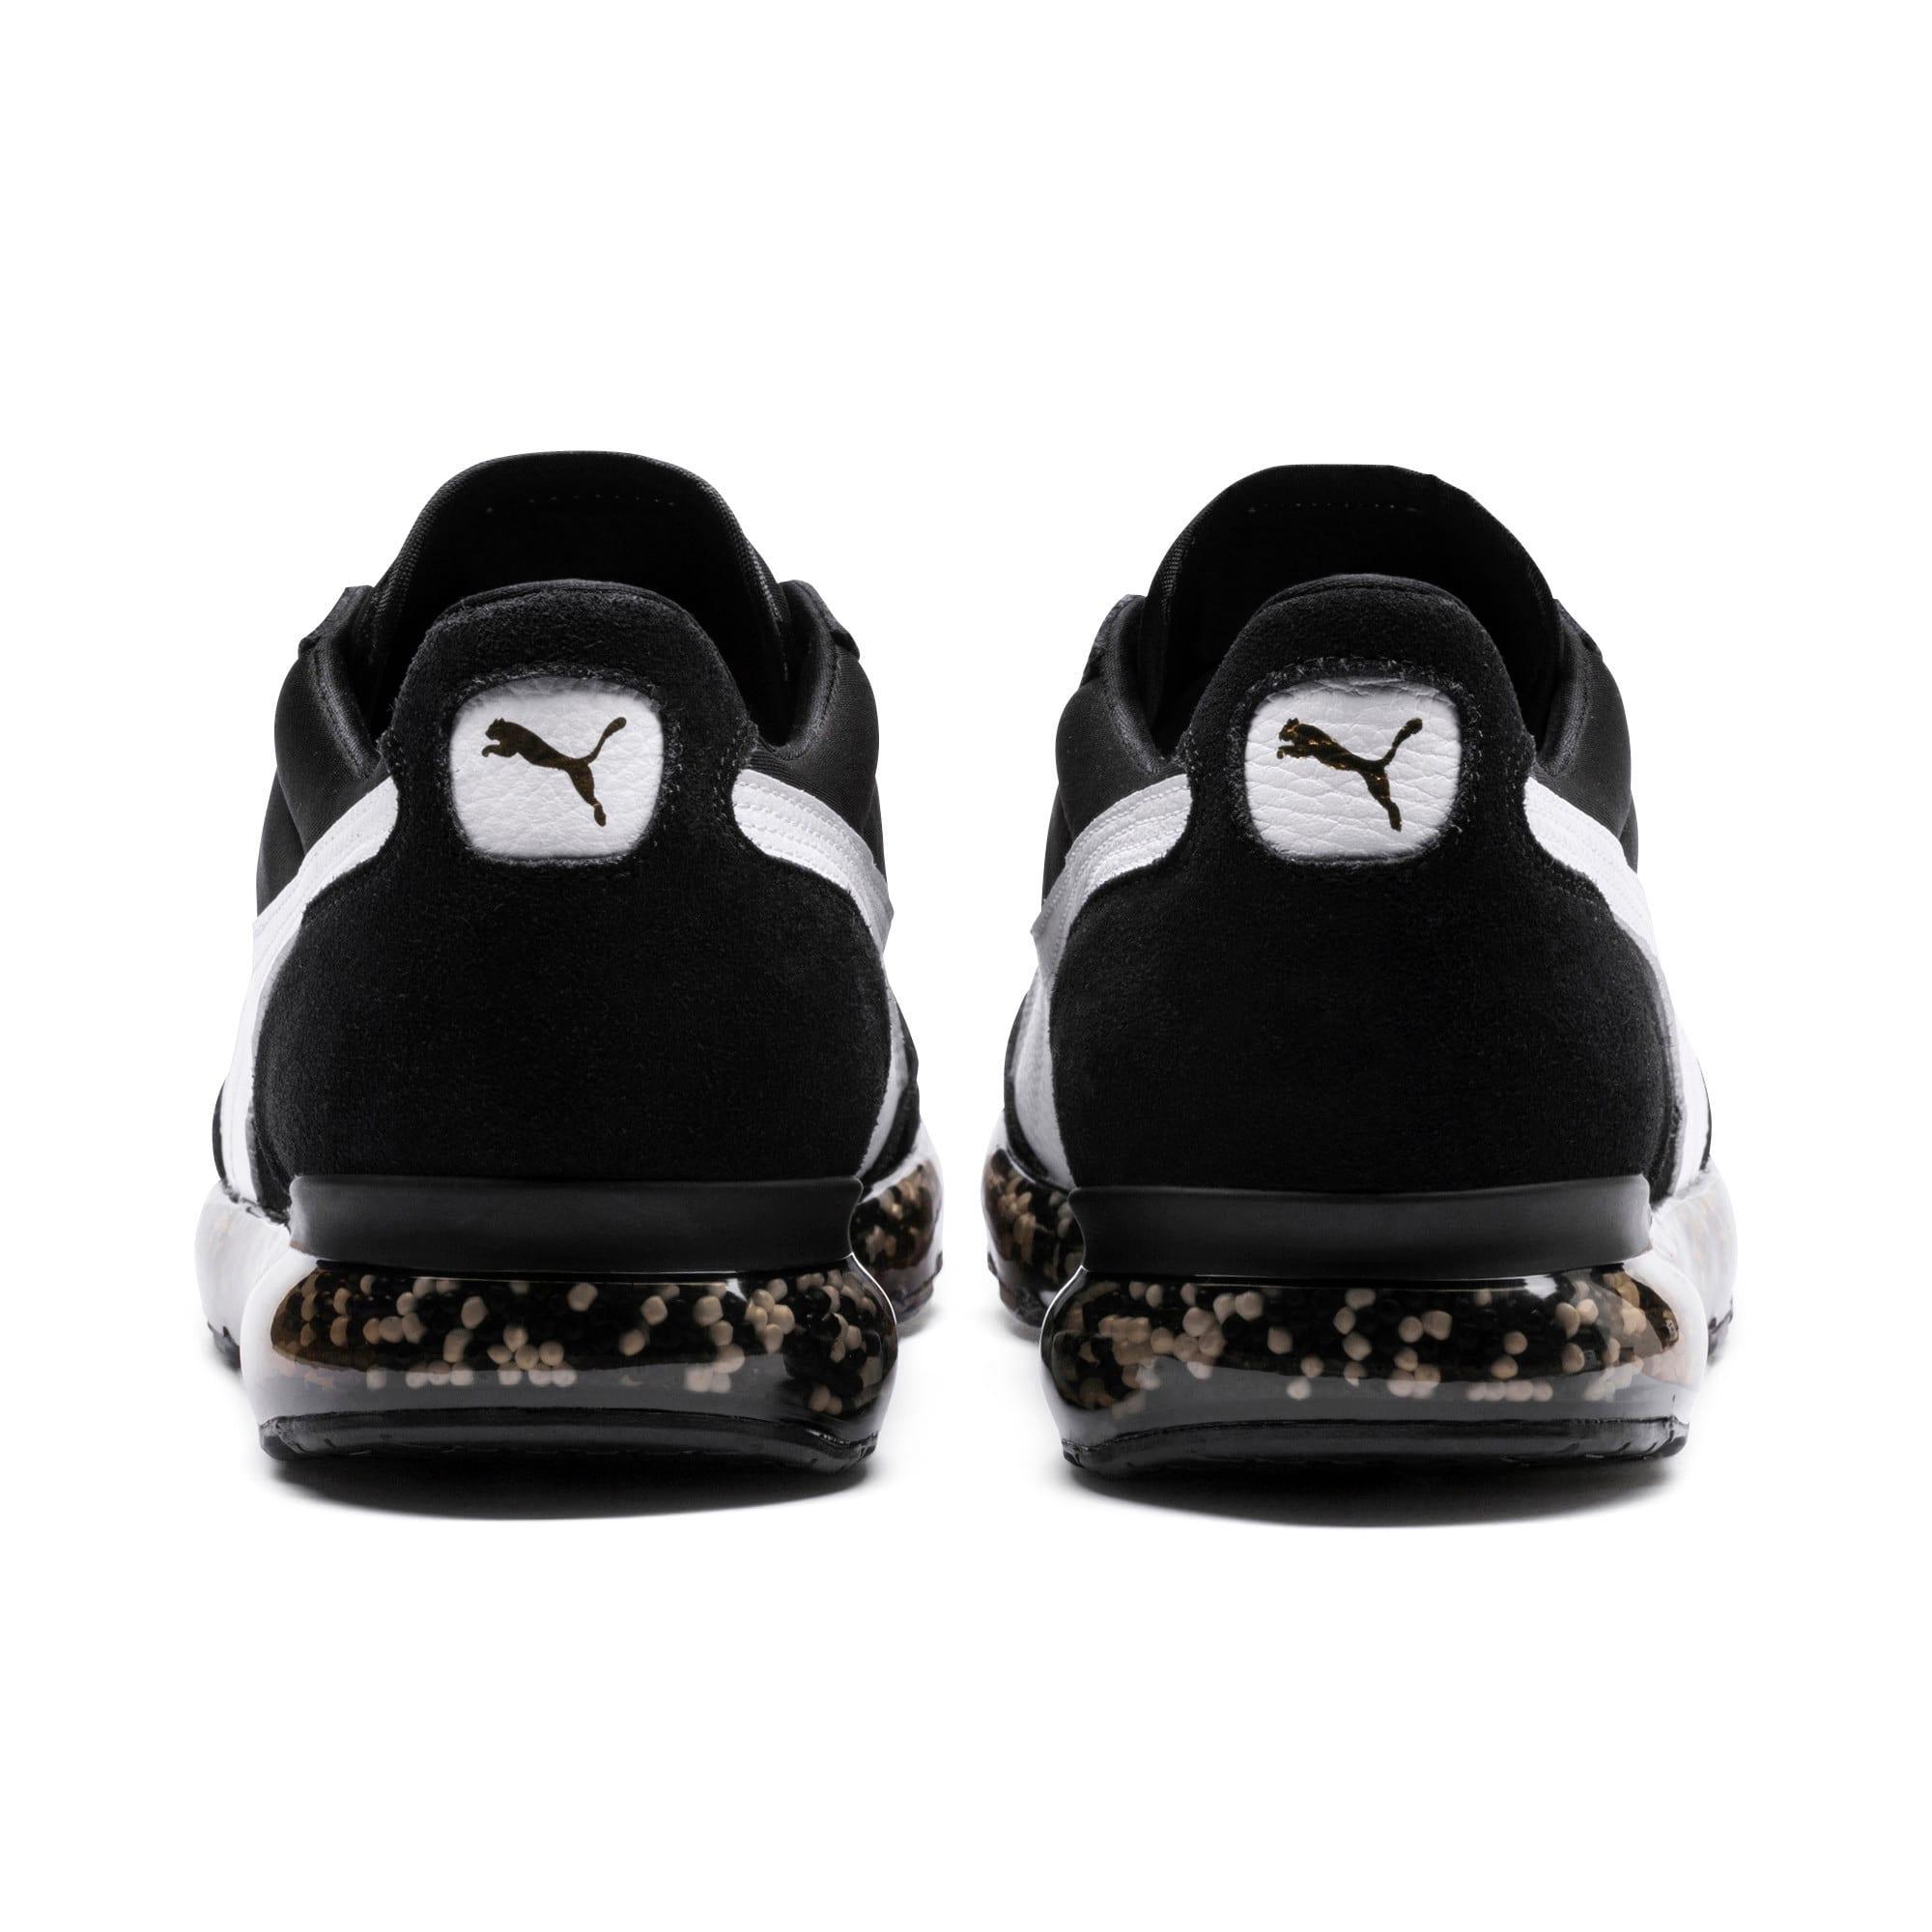 Thumbnail 4 of Jamming Easy Rider Running Shoes, Puma Black-Puma White, medium